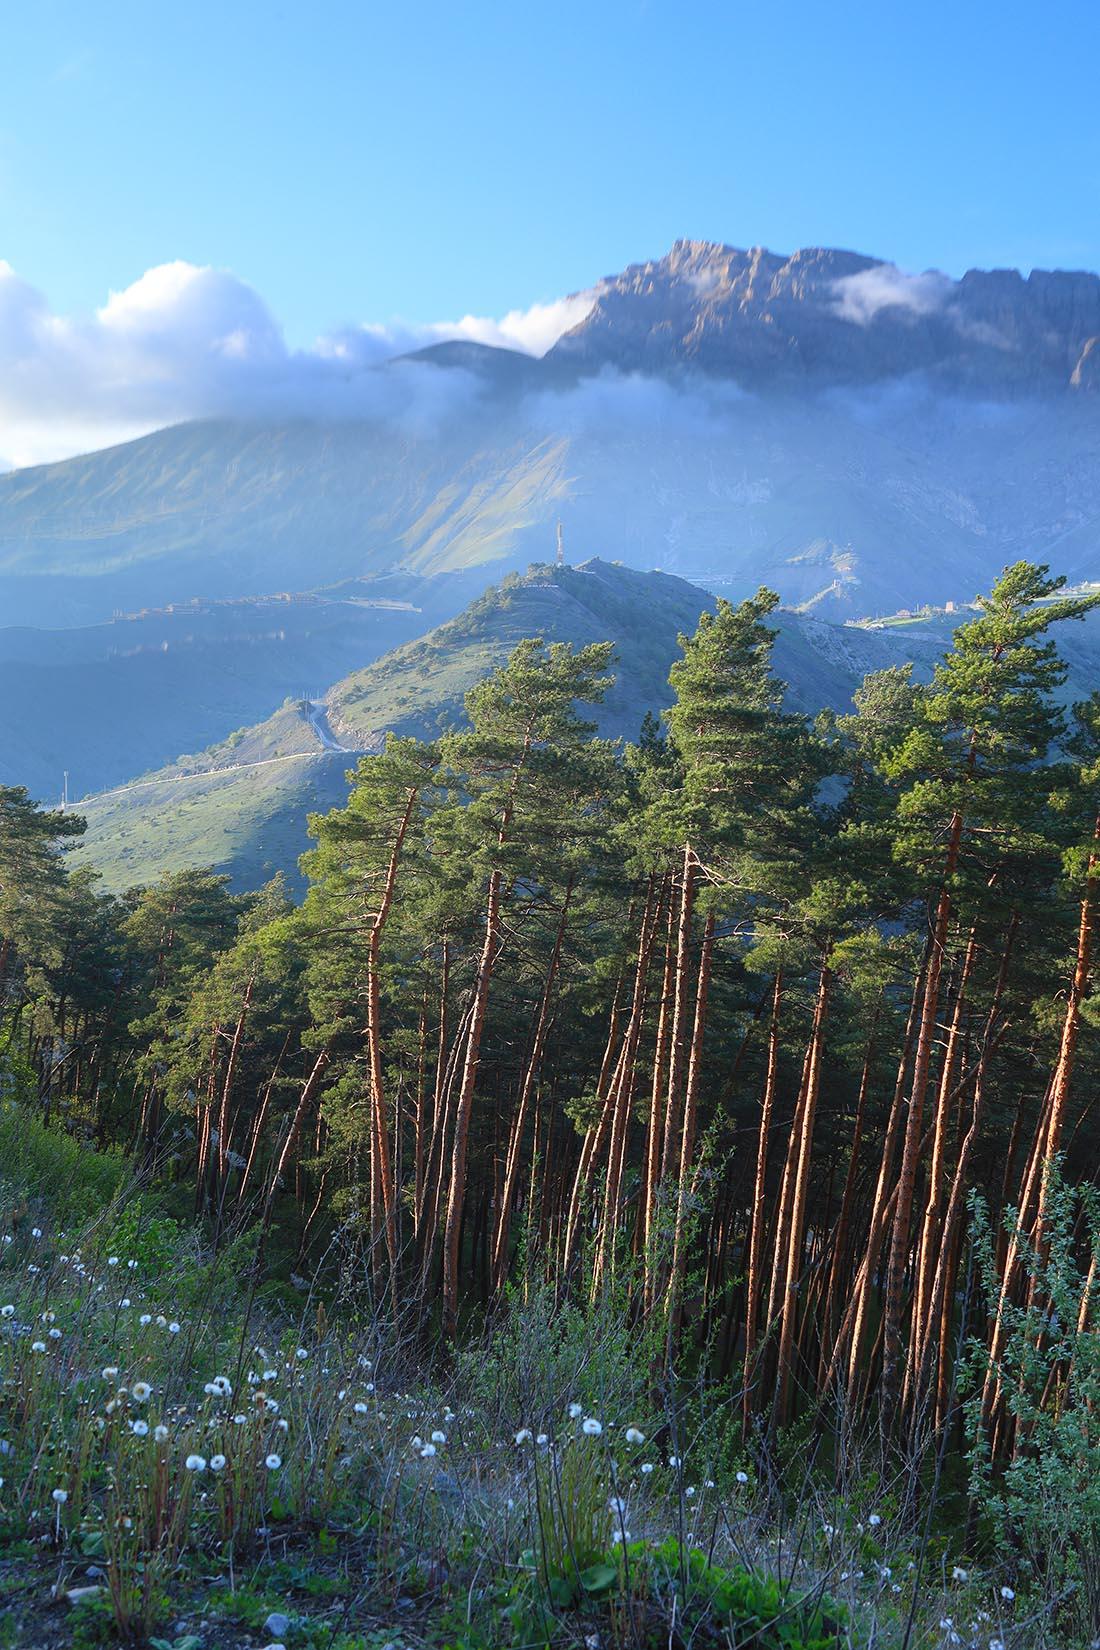 Столовая гора, Ингушетия, Кавказ, Армхи, Борис Резванцев